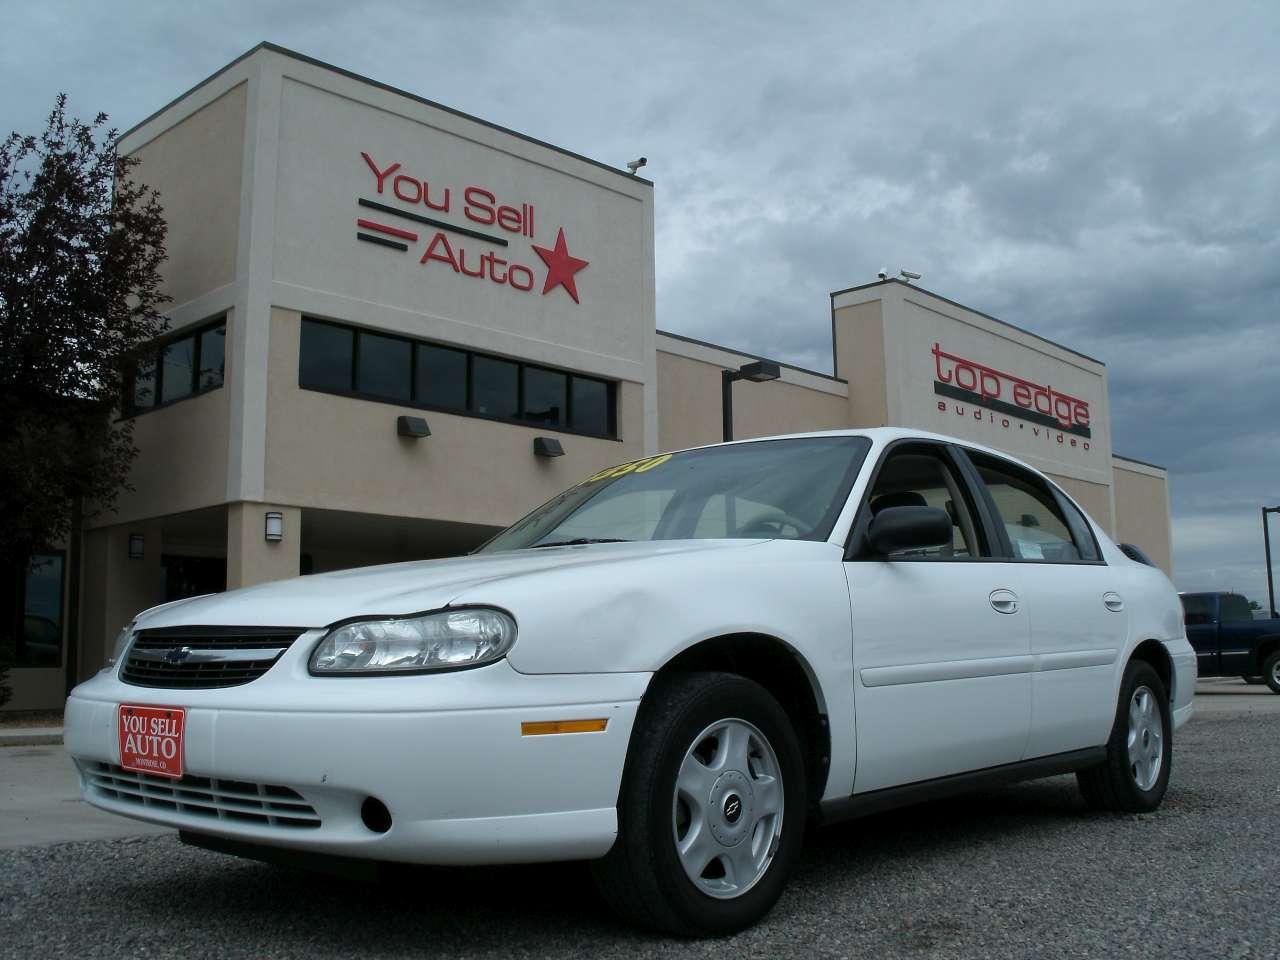 2001 CHEVROLET MALIBU @ $4 350 You Sell Auto #456D86